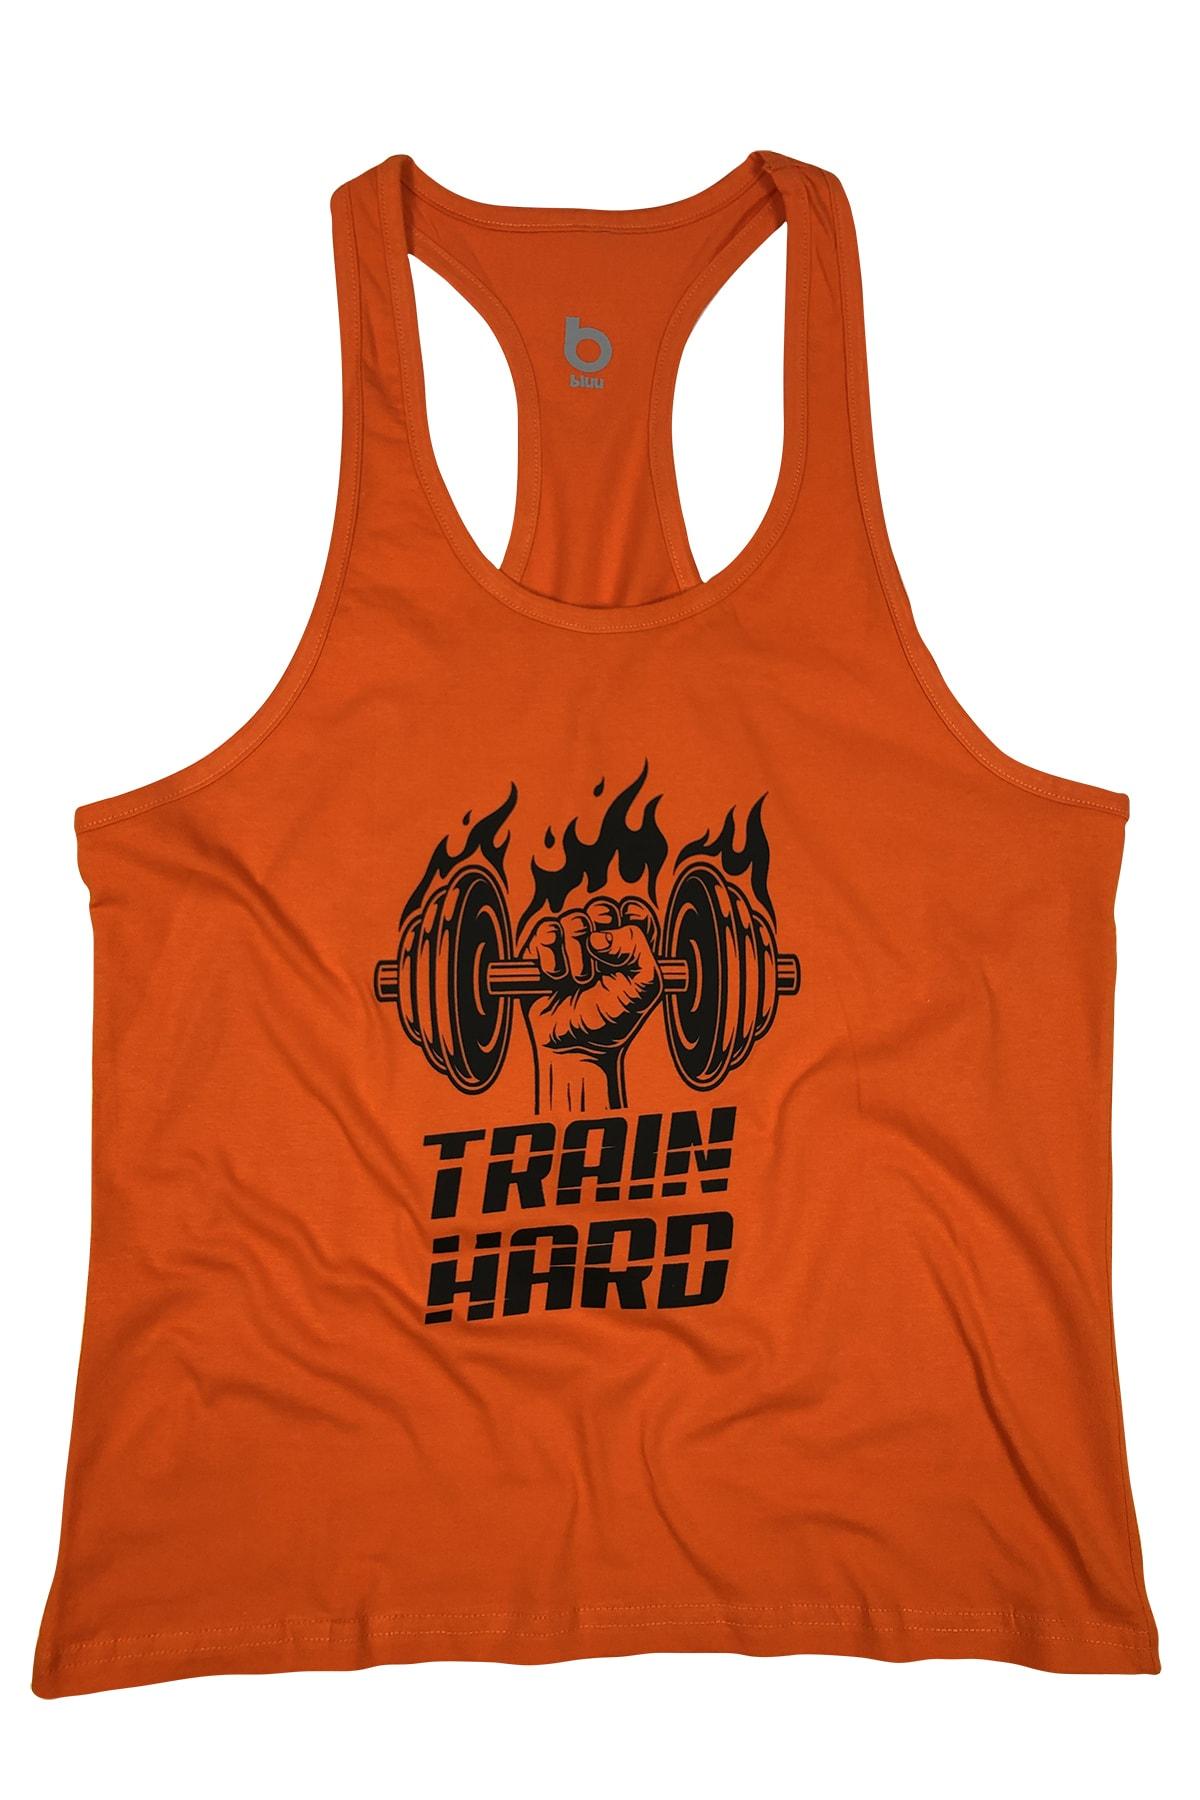 BLUU Fitness Gym Tank Top Sporcu Atleti 4109 1